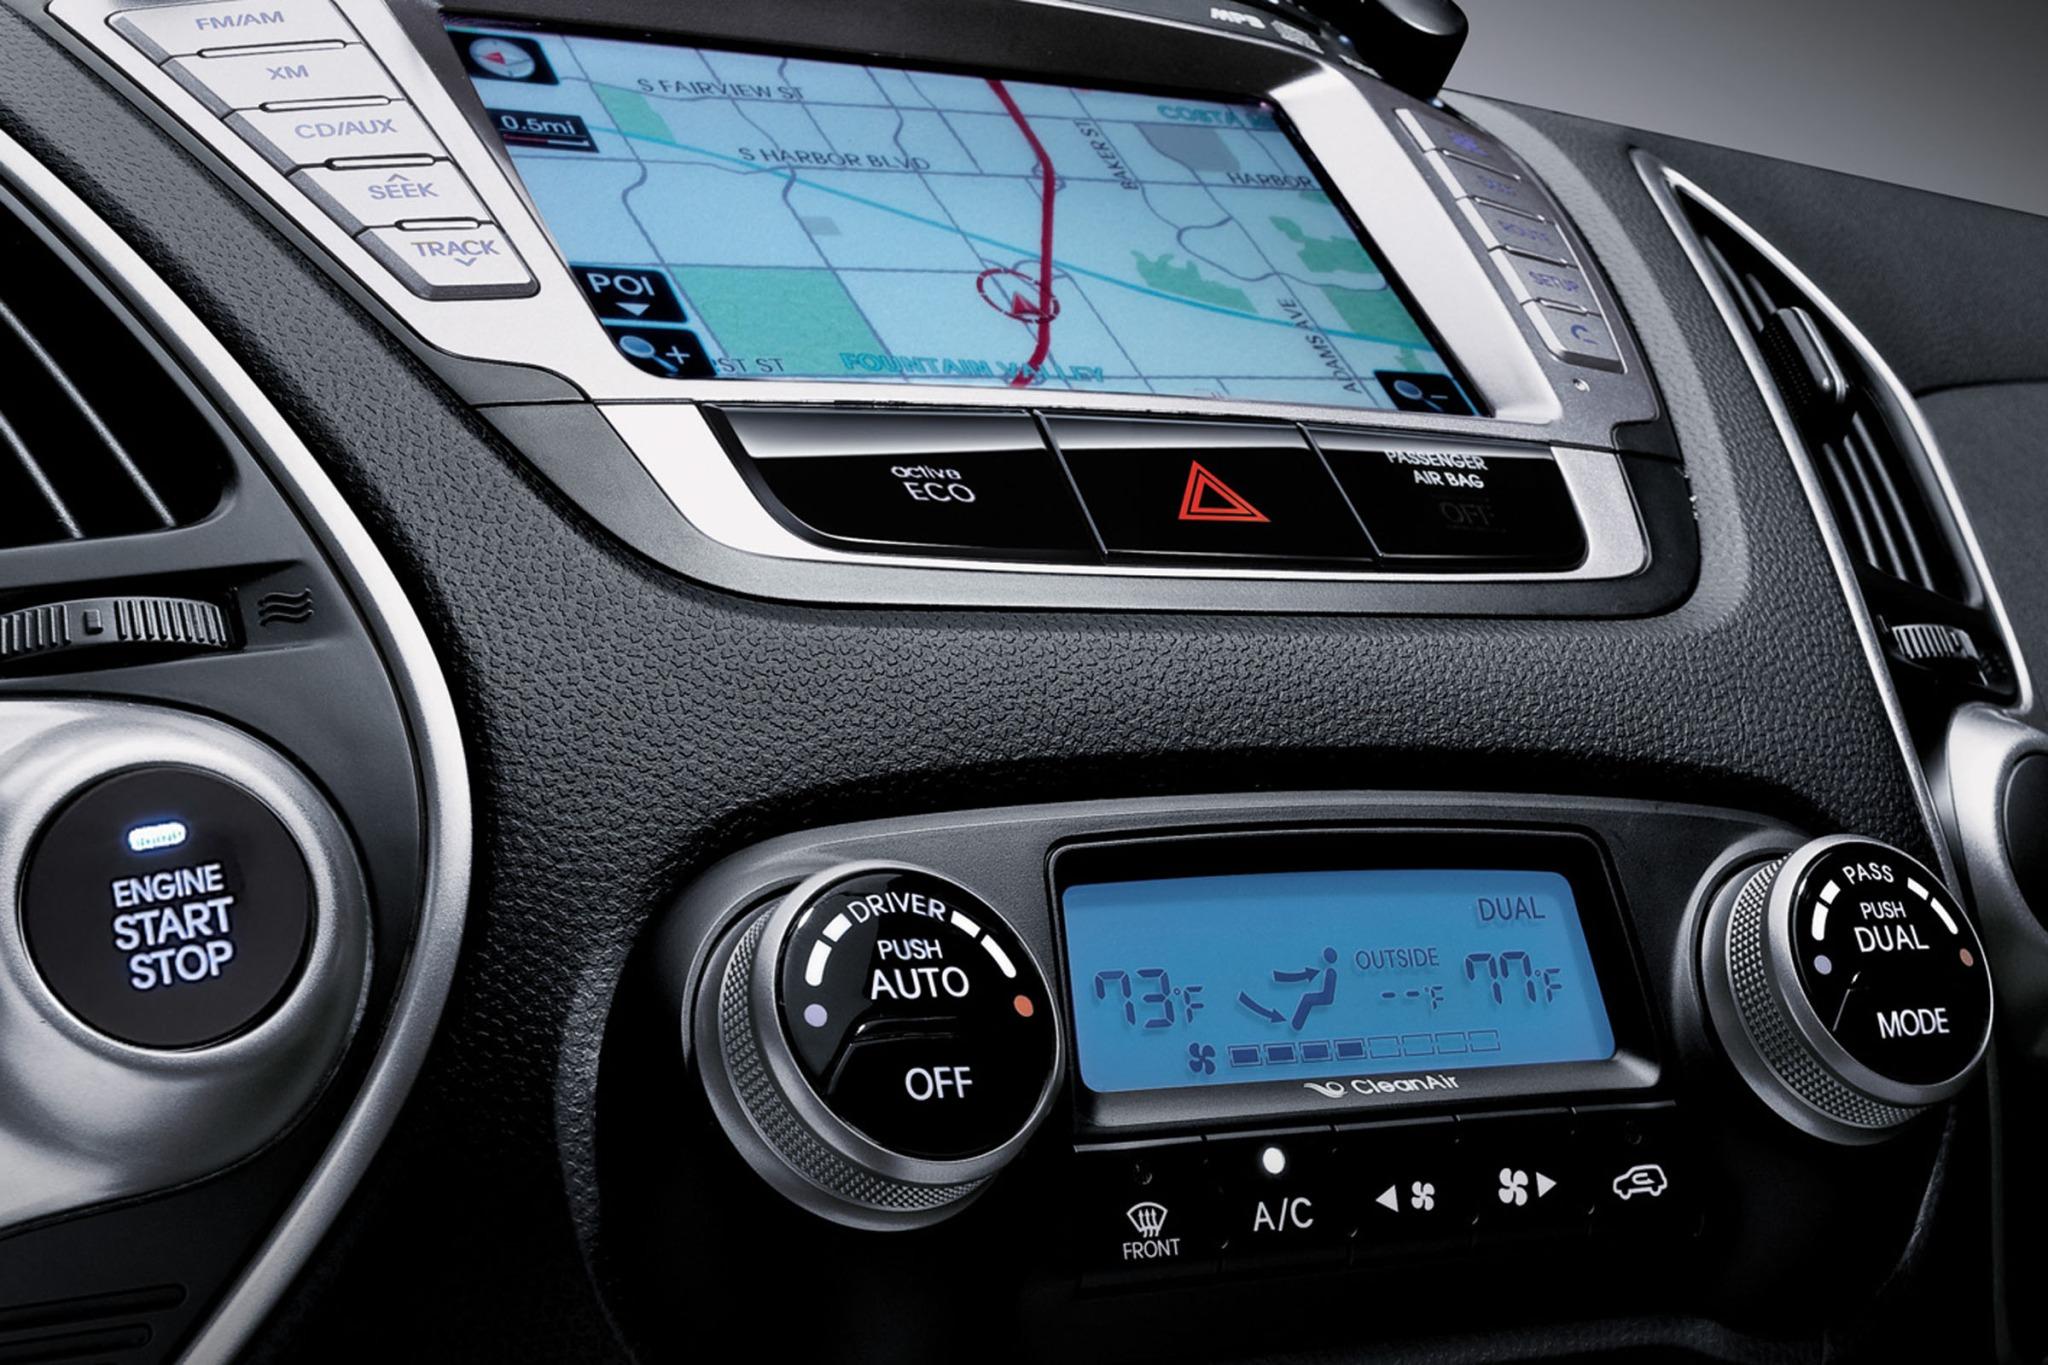 2014 Hyundai Tucson Image 8